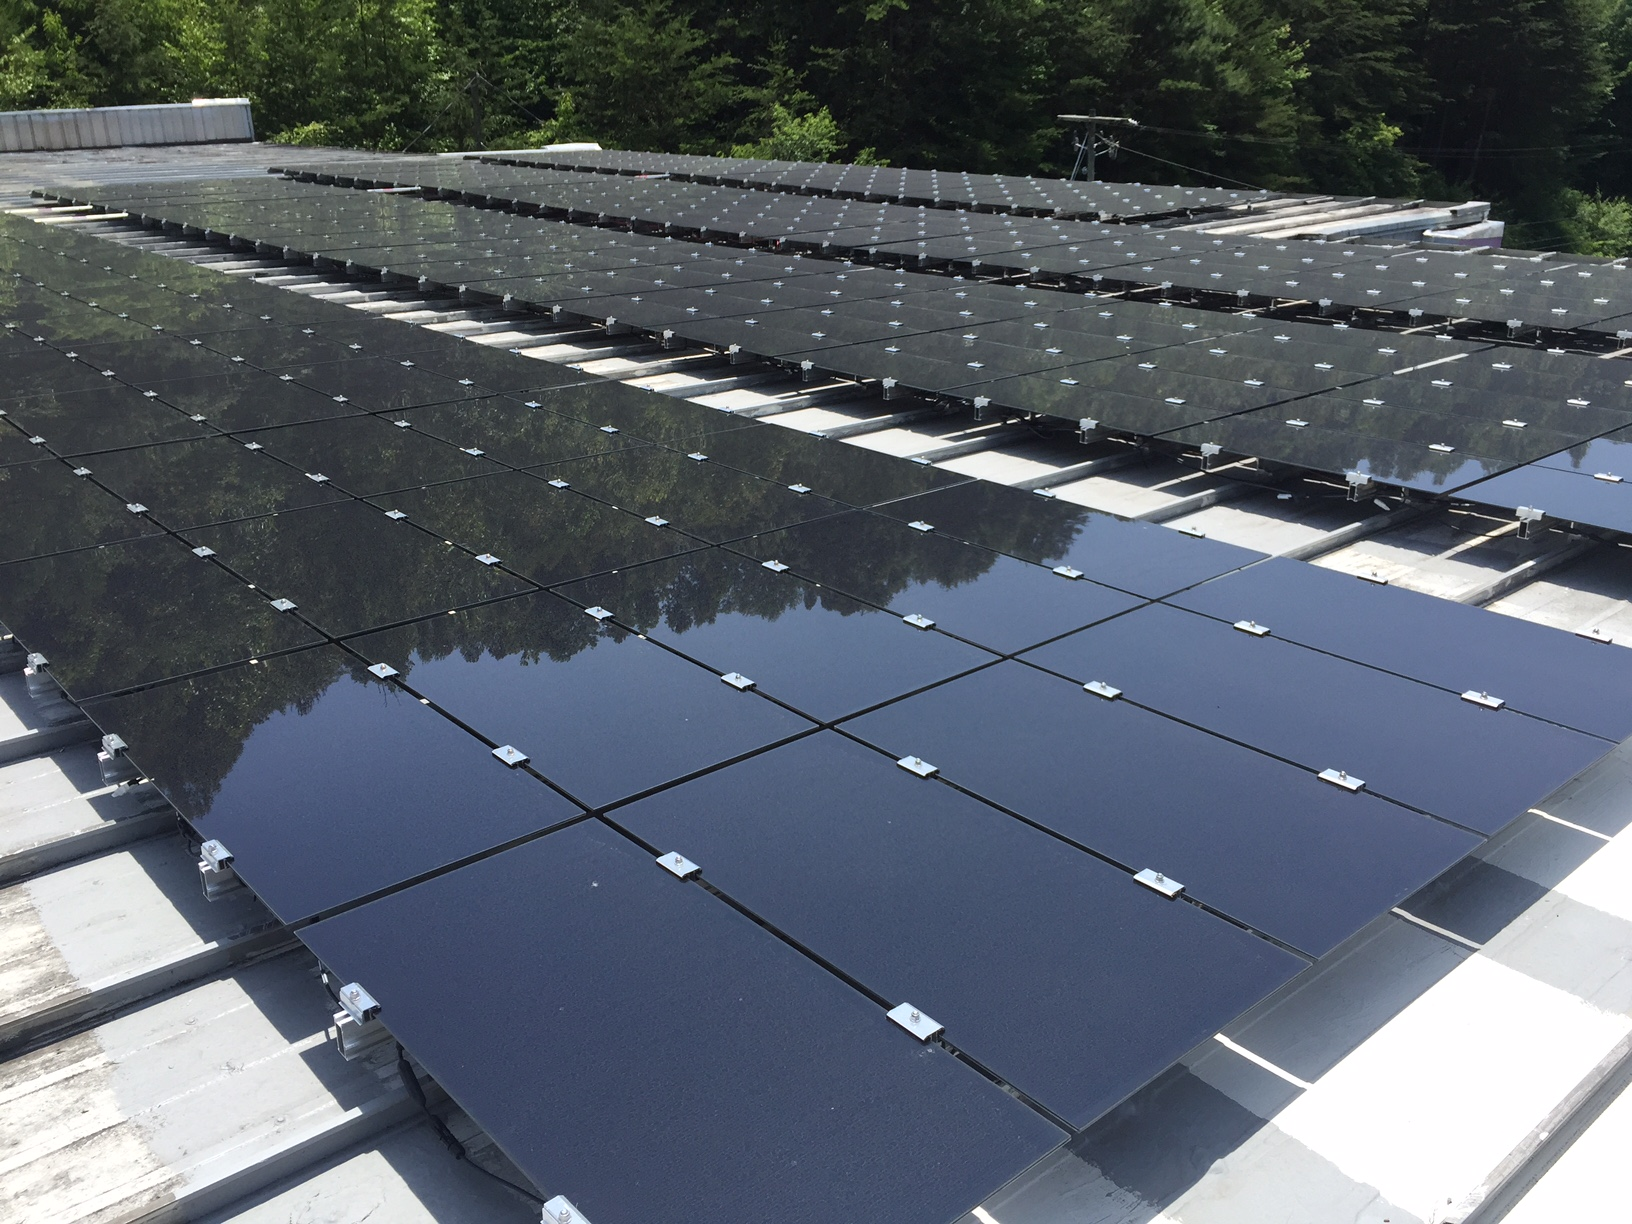 hillside theater case study solar panels